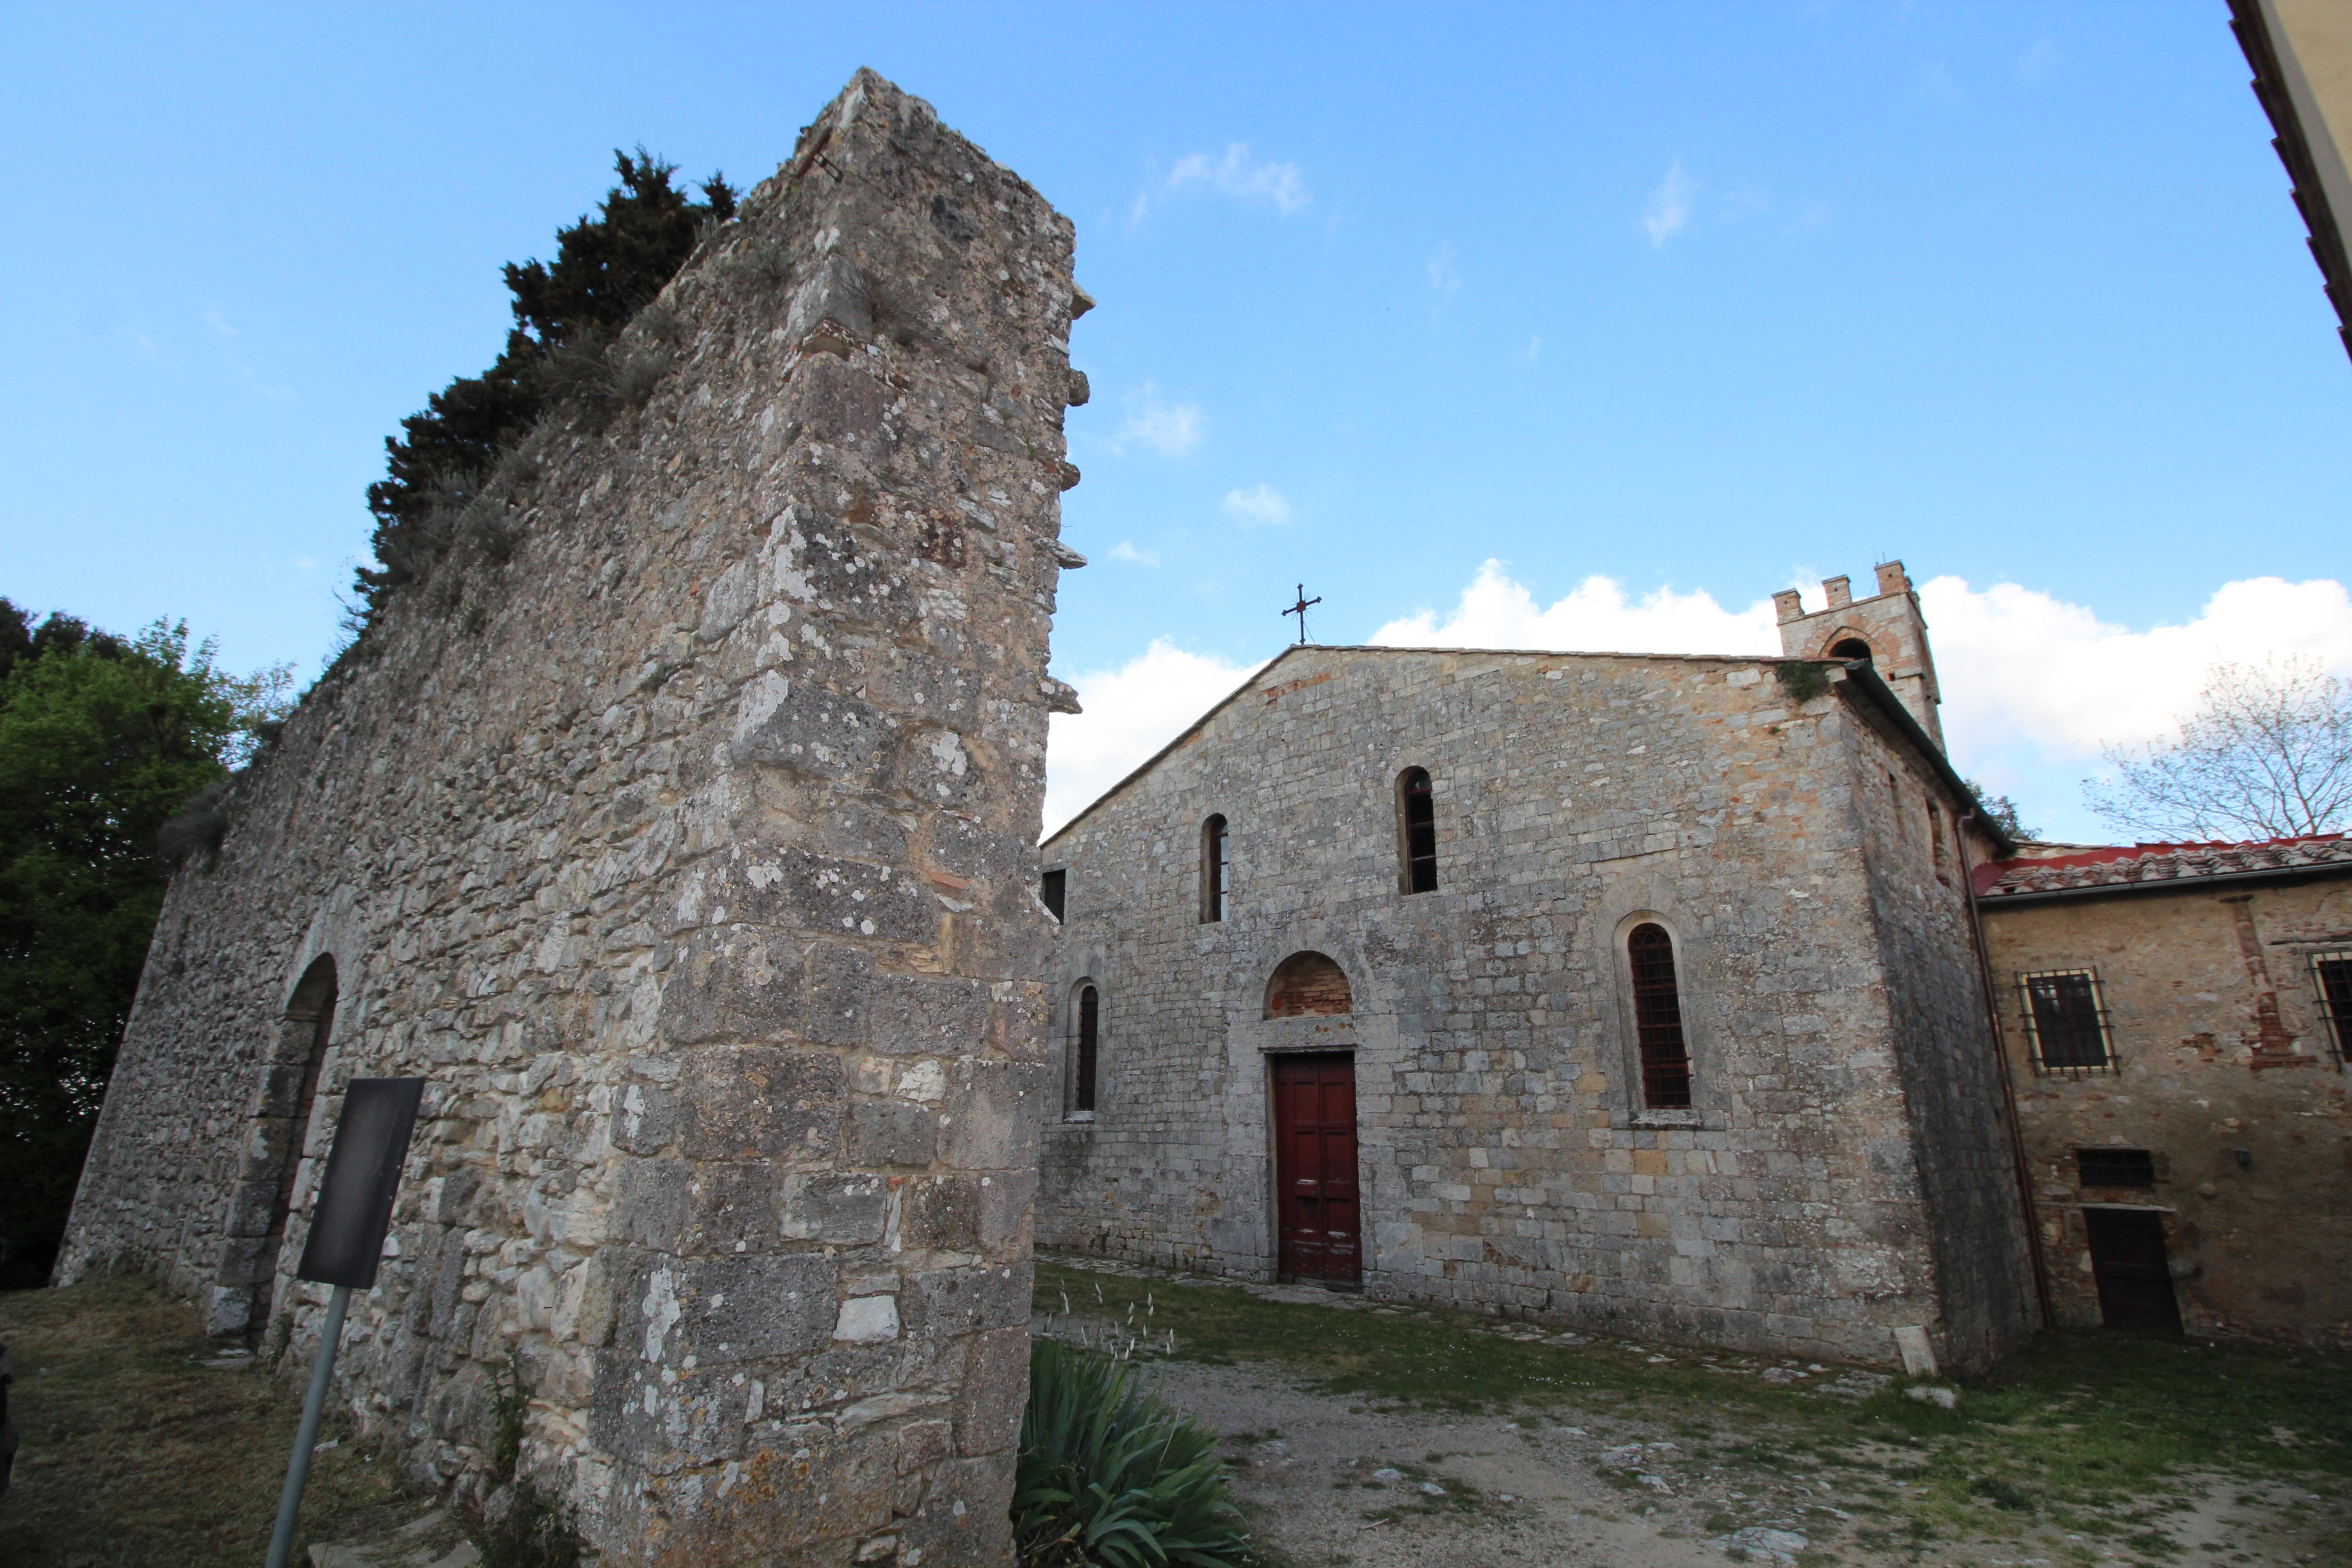 Pieve dei Santi Maria e Gervasio (Marmoraia)